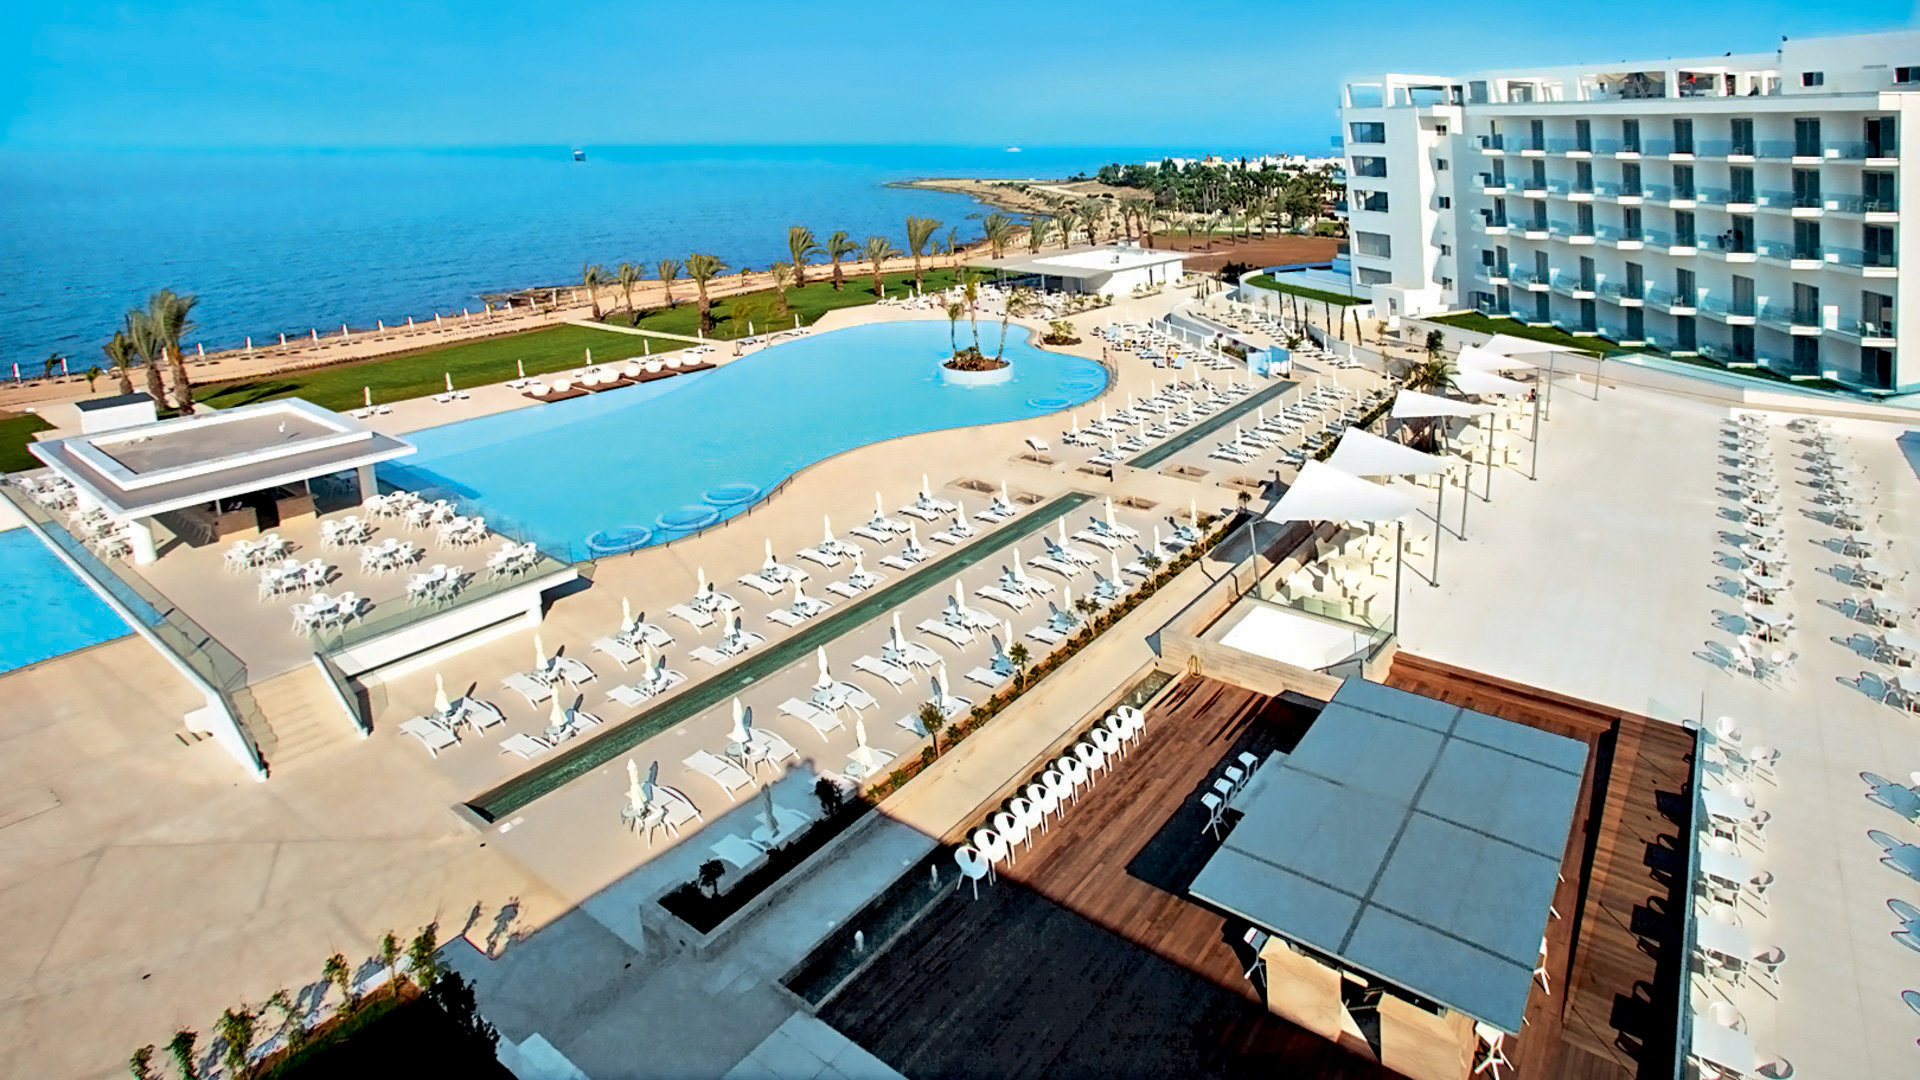 King Evelthon Beach & Resort